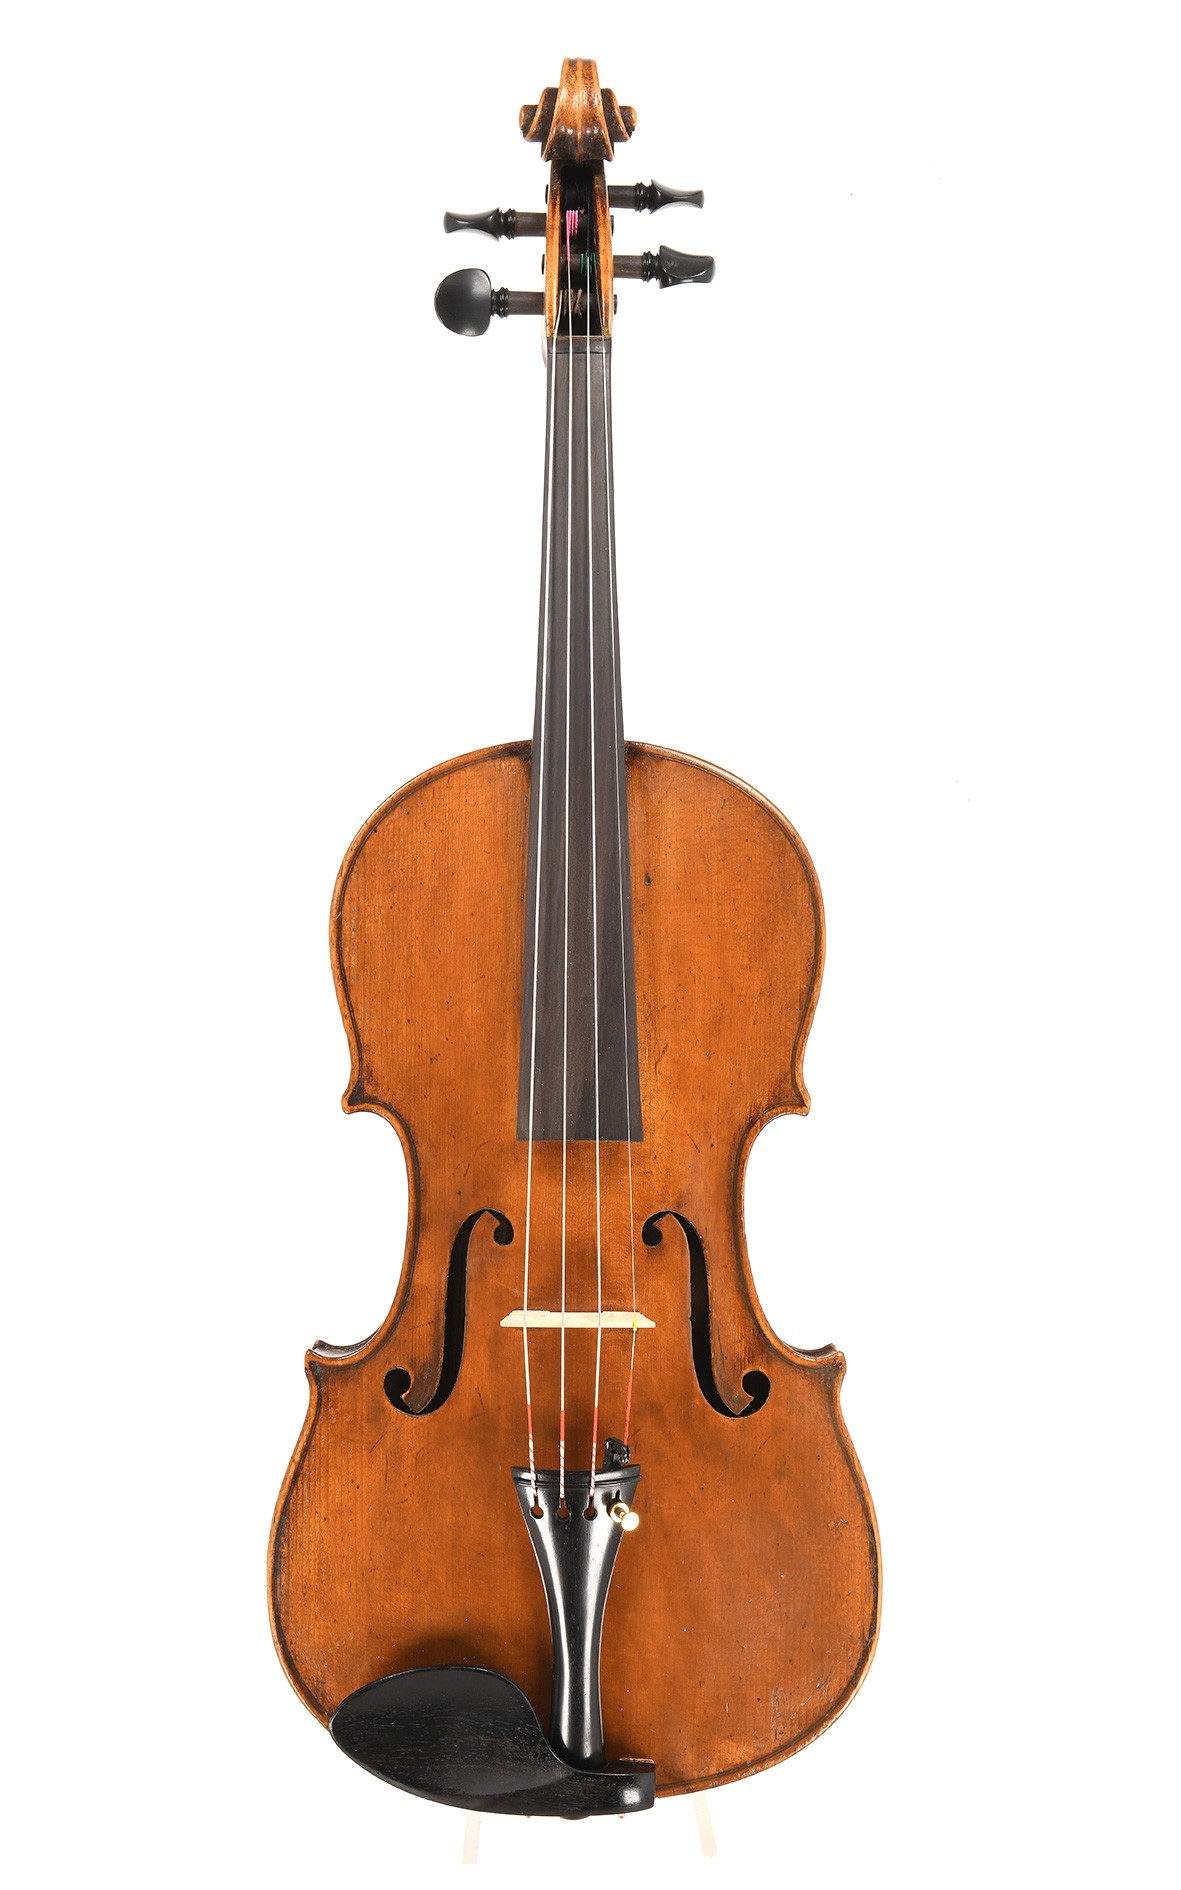 Geige aus Markneukirchen. Hermann Dölling Jr.